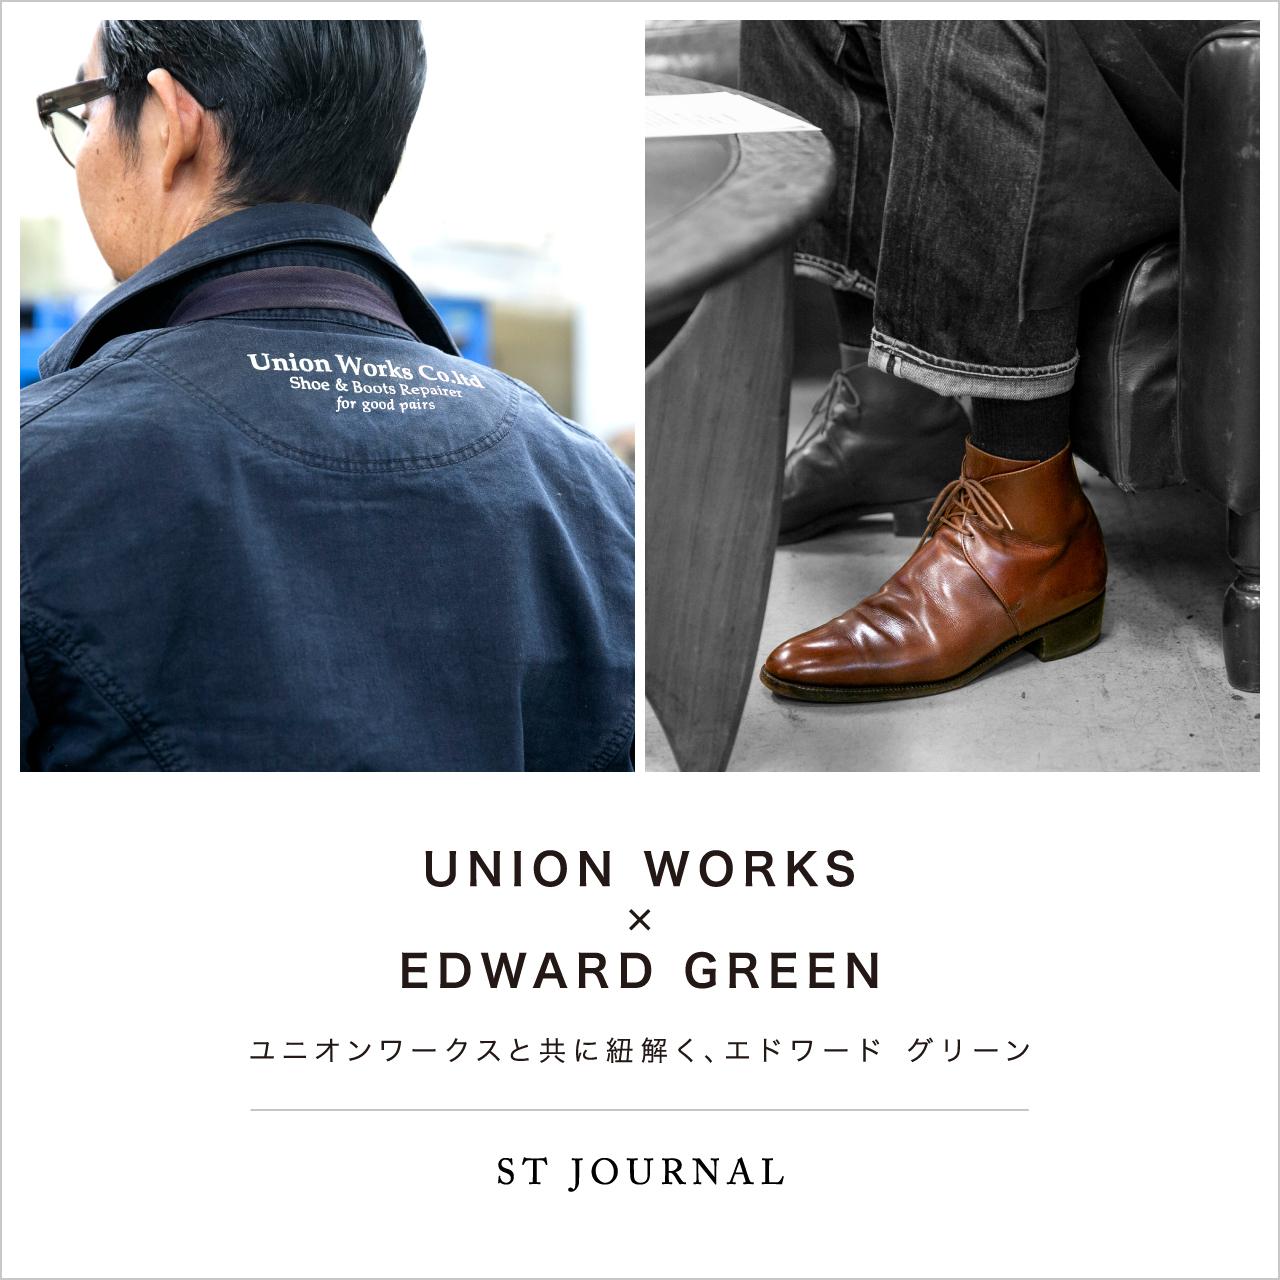 UNION WORKS×EDWARD GREEN Vol.1『ユニオンワークスと共に紐解く、エドワード グリーン』